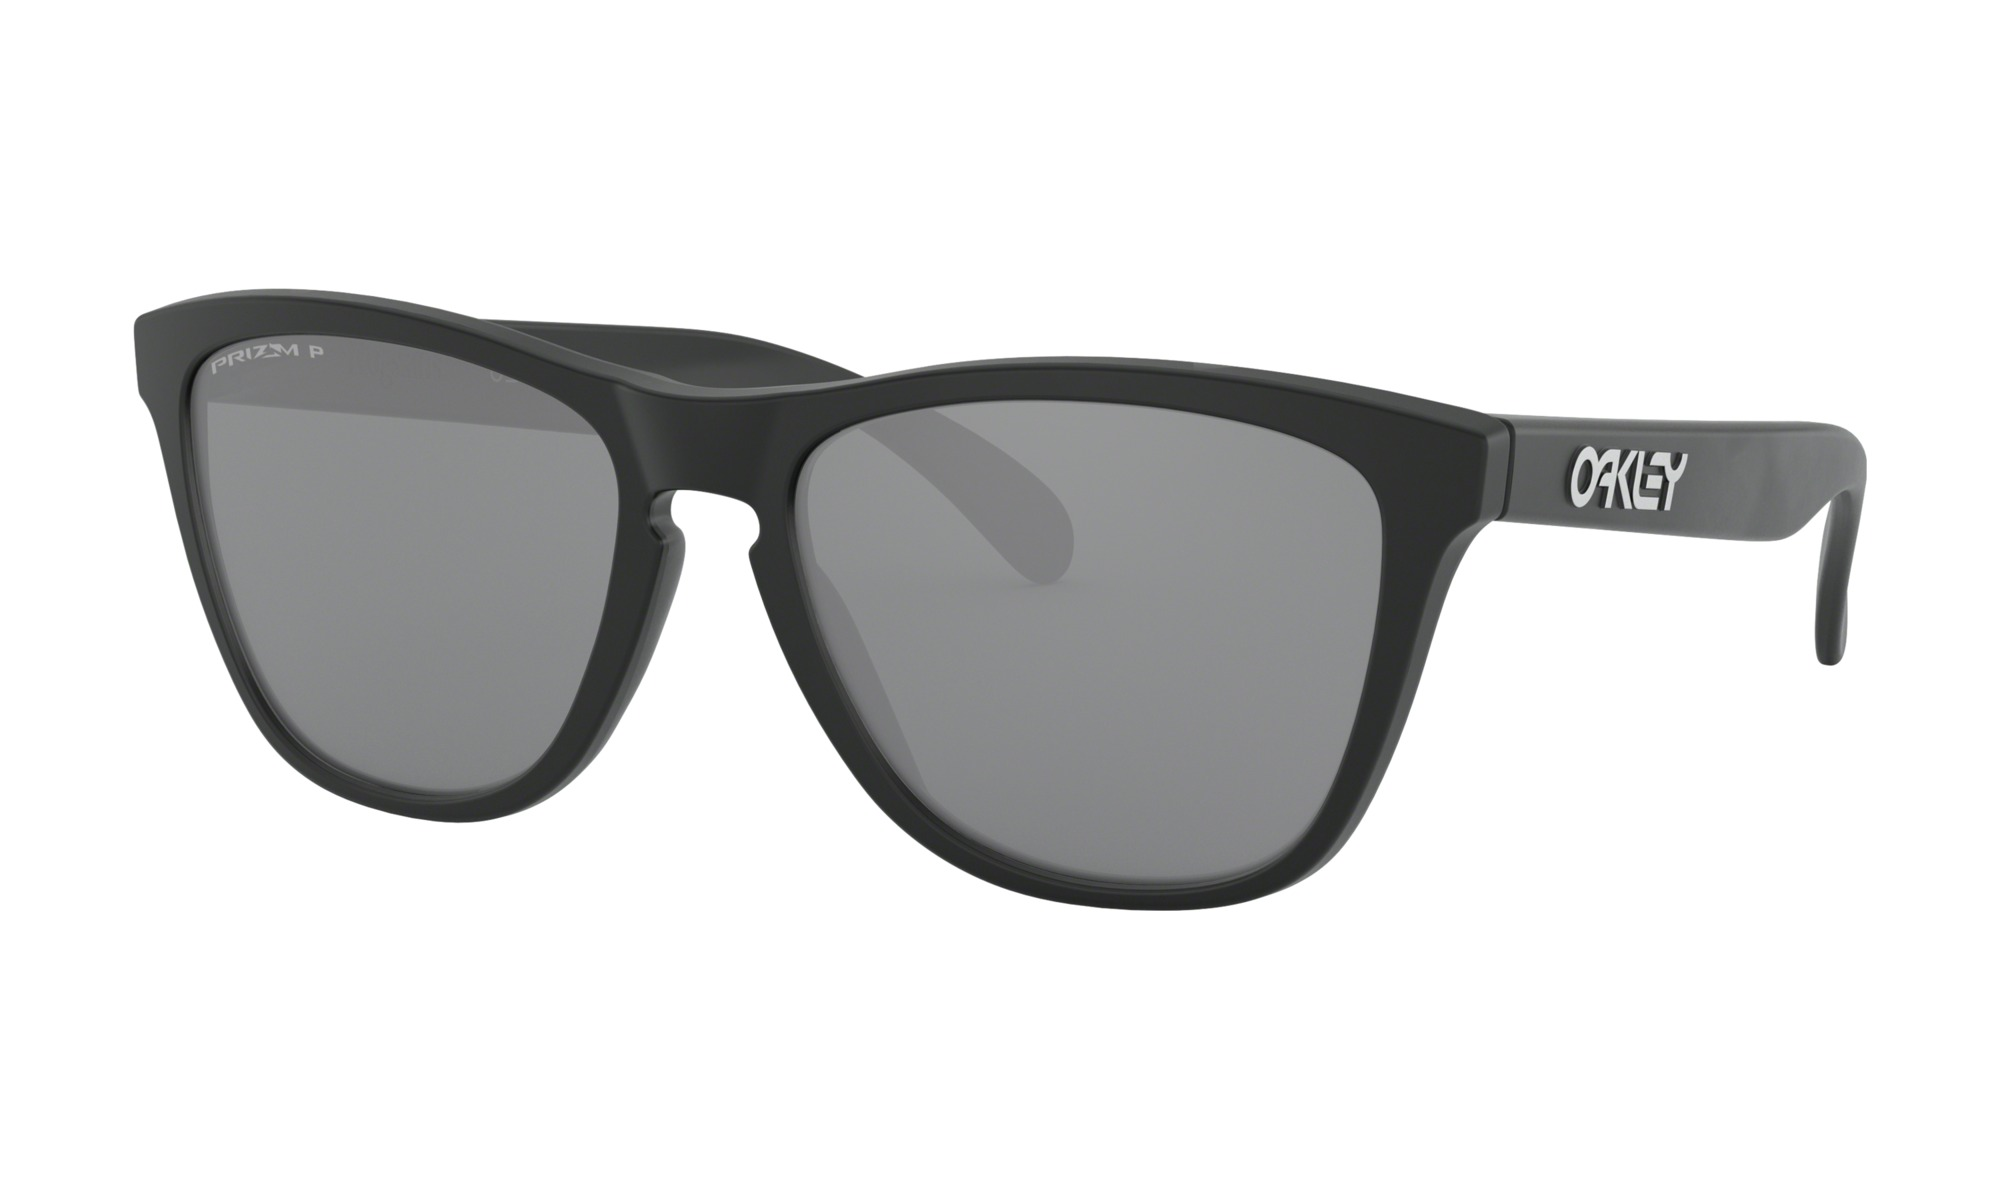 Black Oakley Lunettes RefOo9013 Prizm Frogskins Polarized Matte F755 0On8wkPX